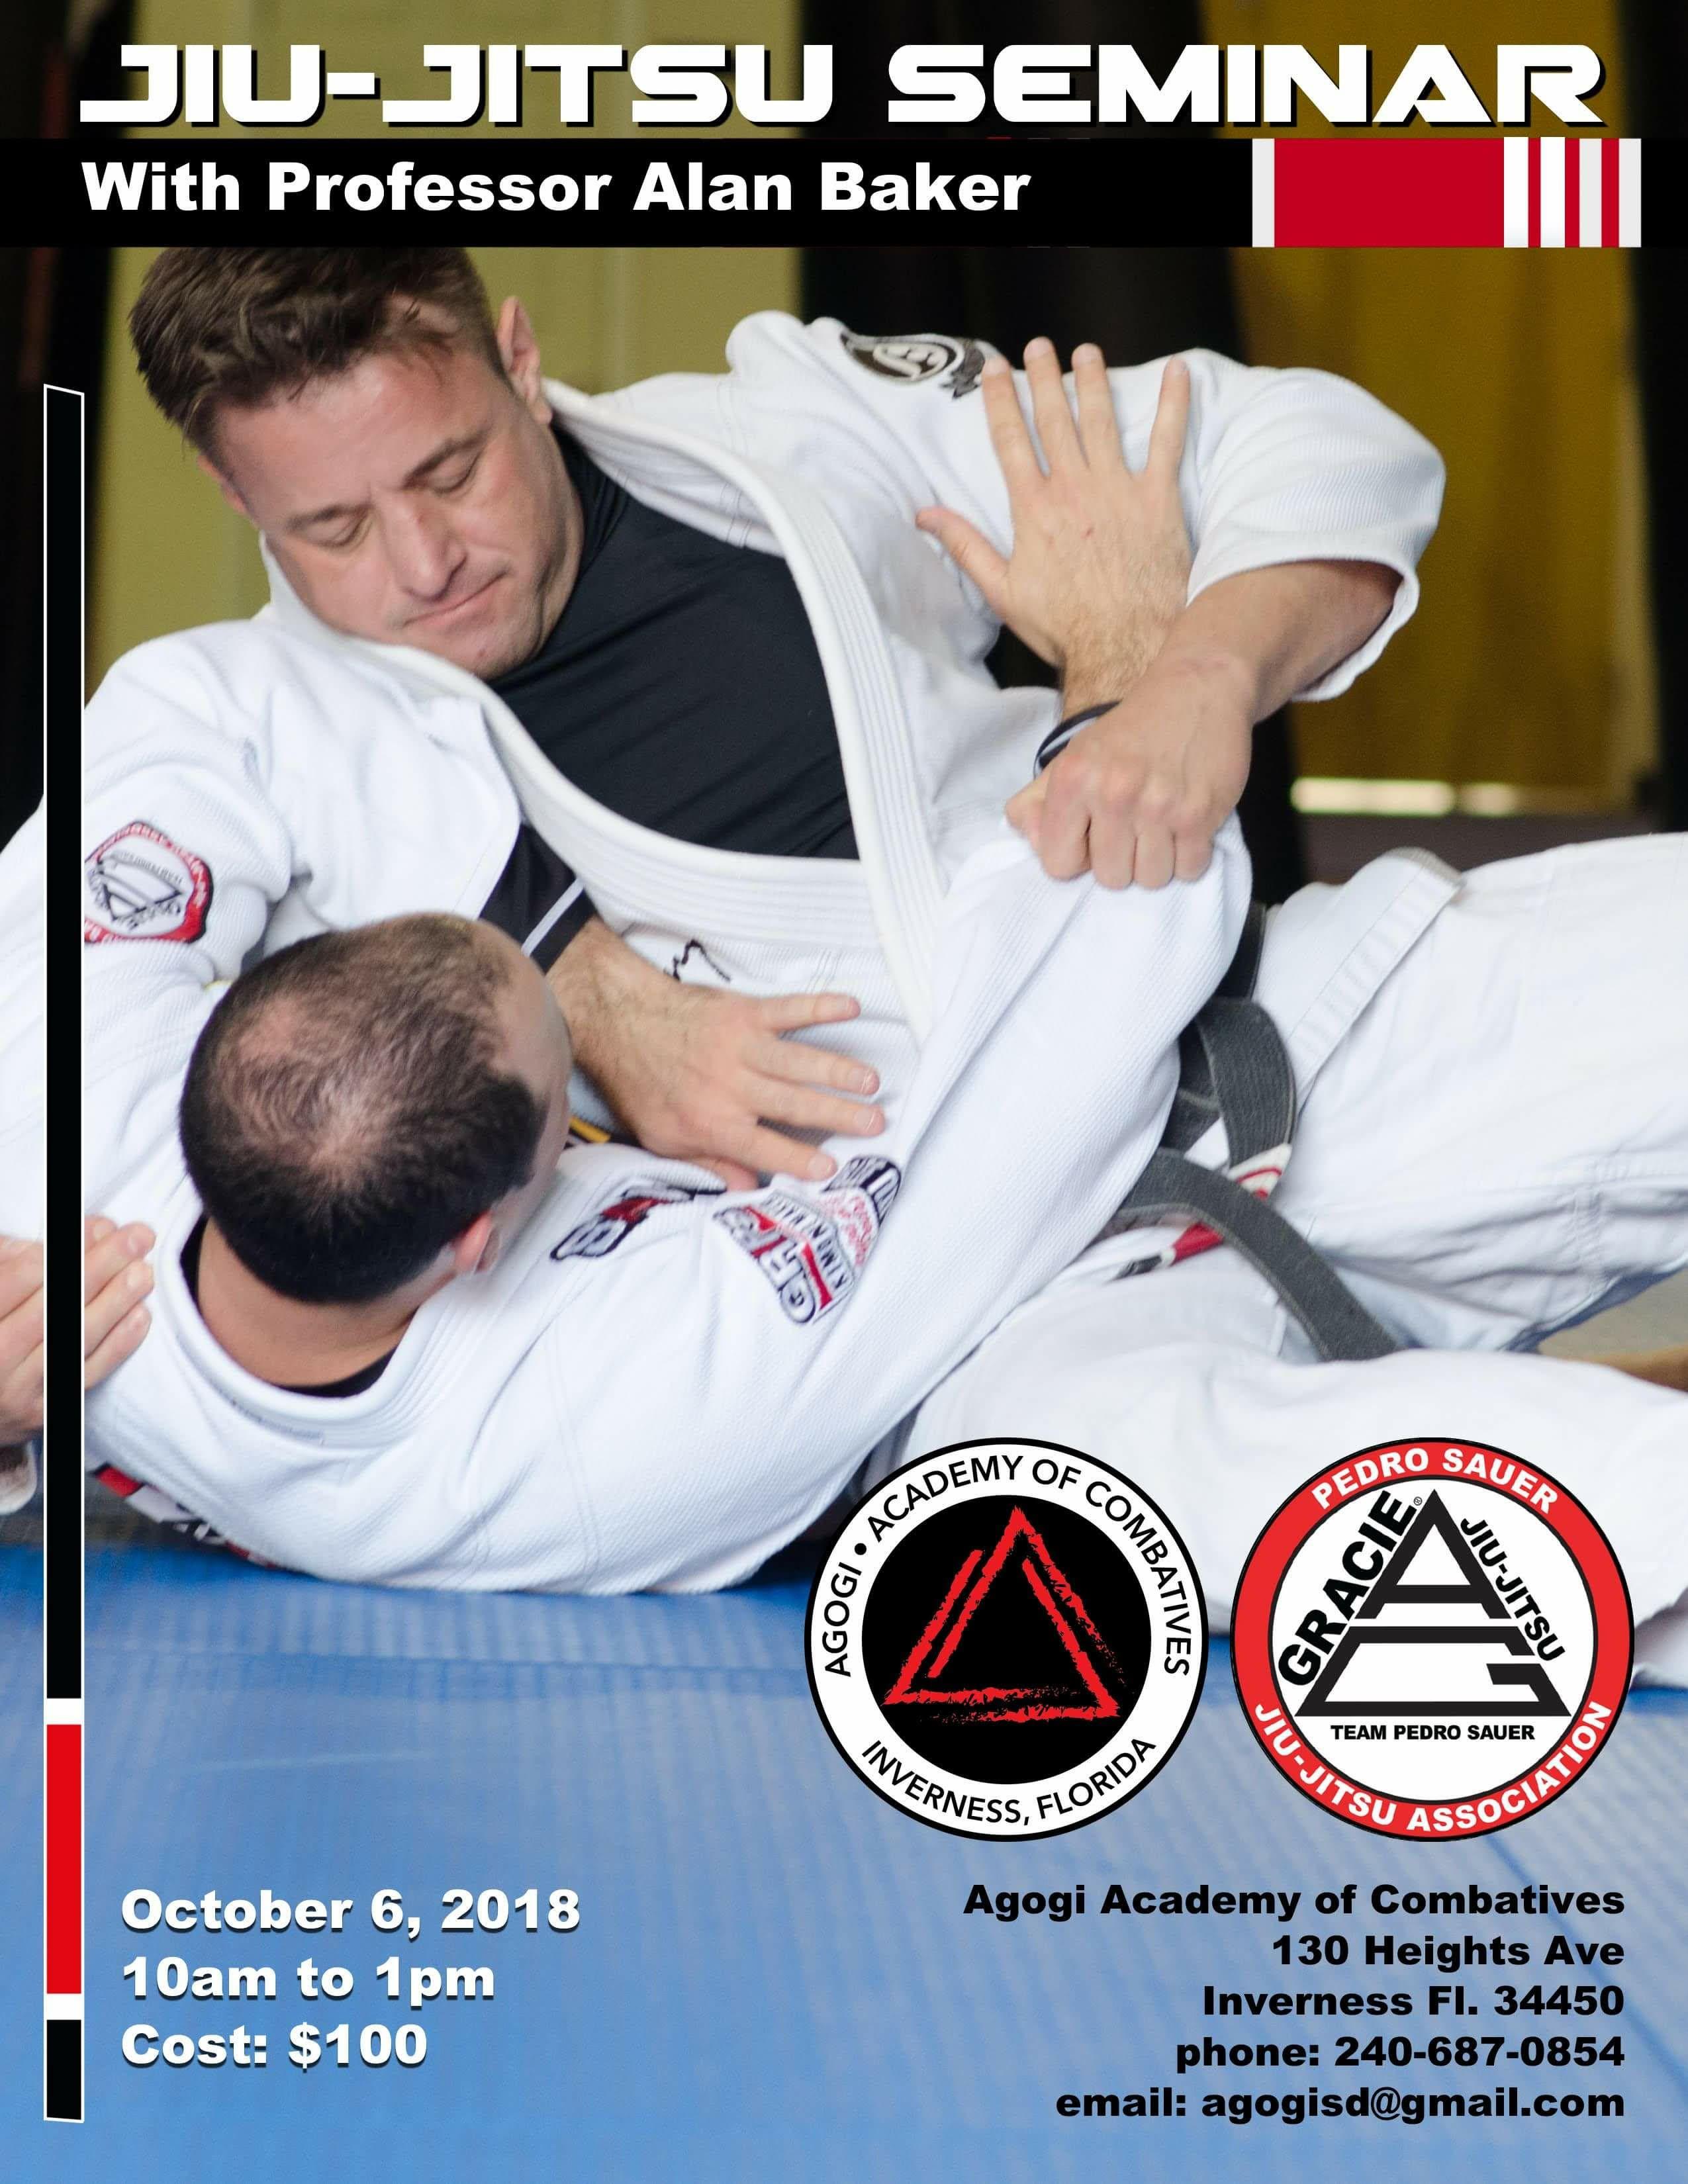 Pin By Agogi Academy Of Combatives On Agogi Academy Of Combatives Jiu Jitsu Trive Inverness Florida Jiu Jitsu Inverness